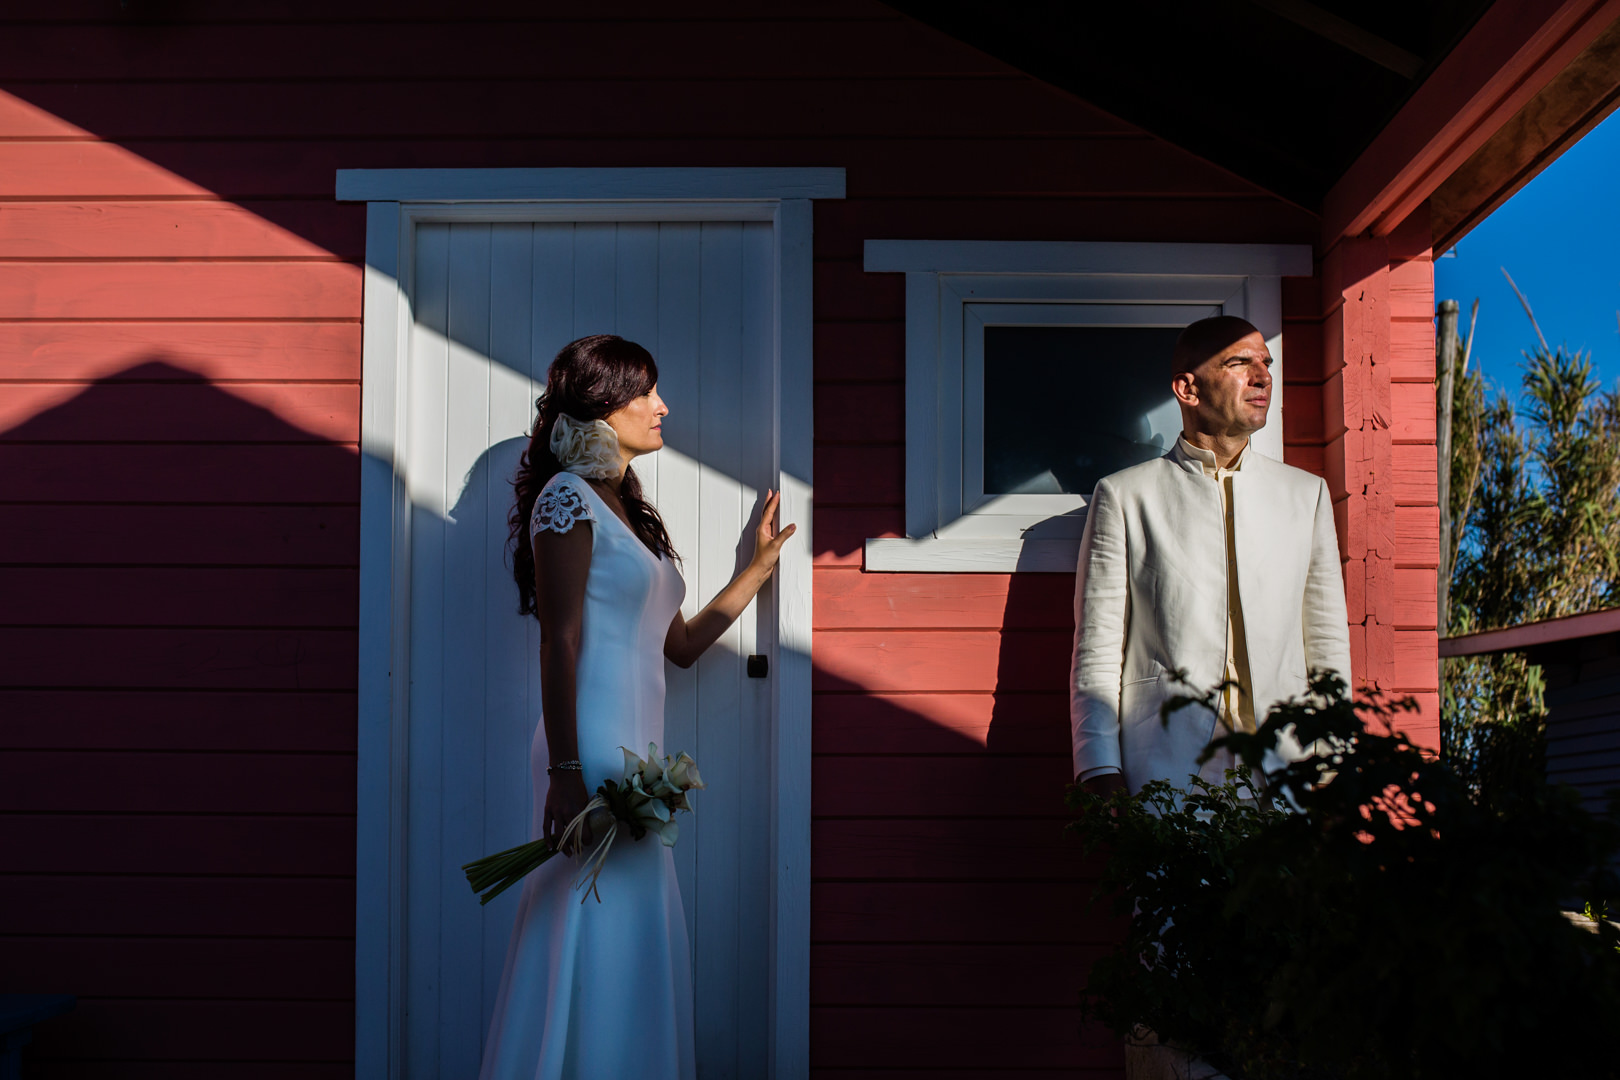 Boda-Sajorami-Beach-Cadiz-Zahora-Pedro-Gema-engagement-Rafael-Torres-fotografo-bodas-sevilla-madrid-barcelona-wedding-photographer--37.jpg